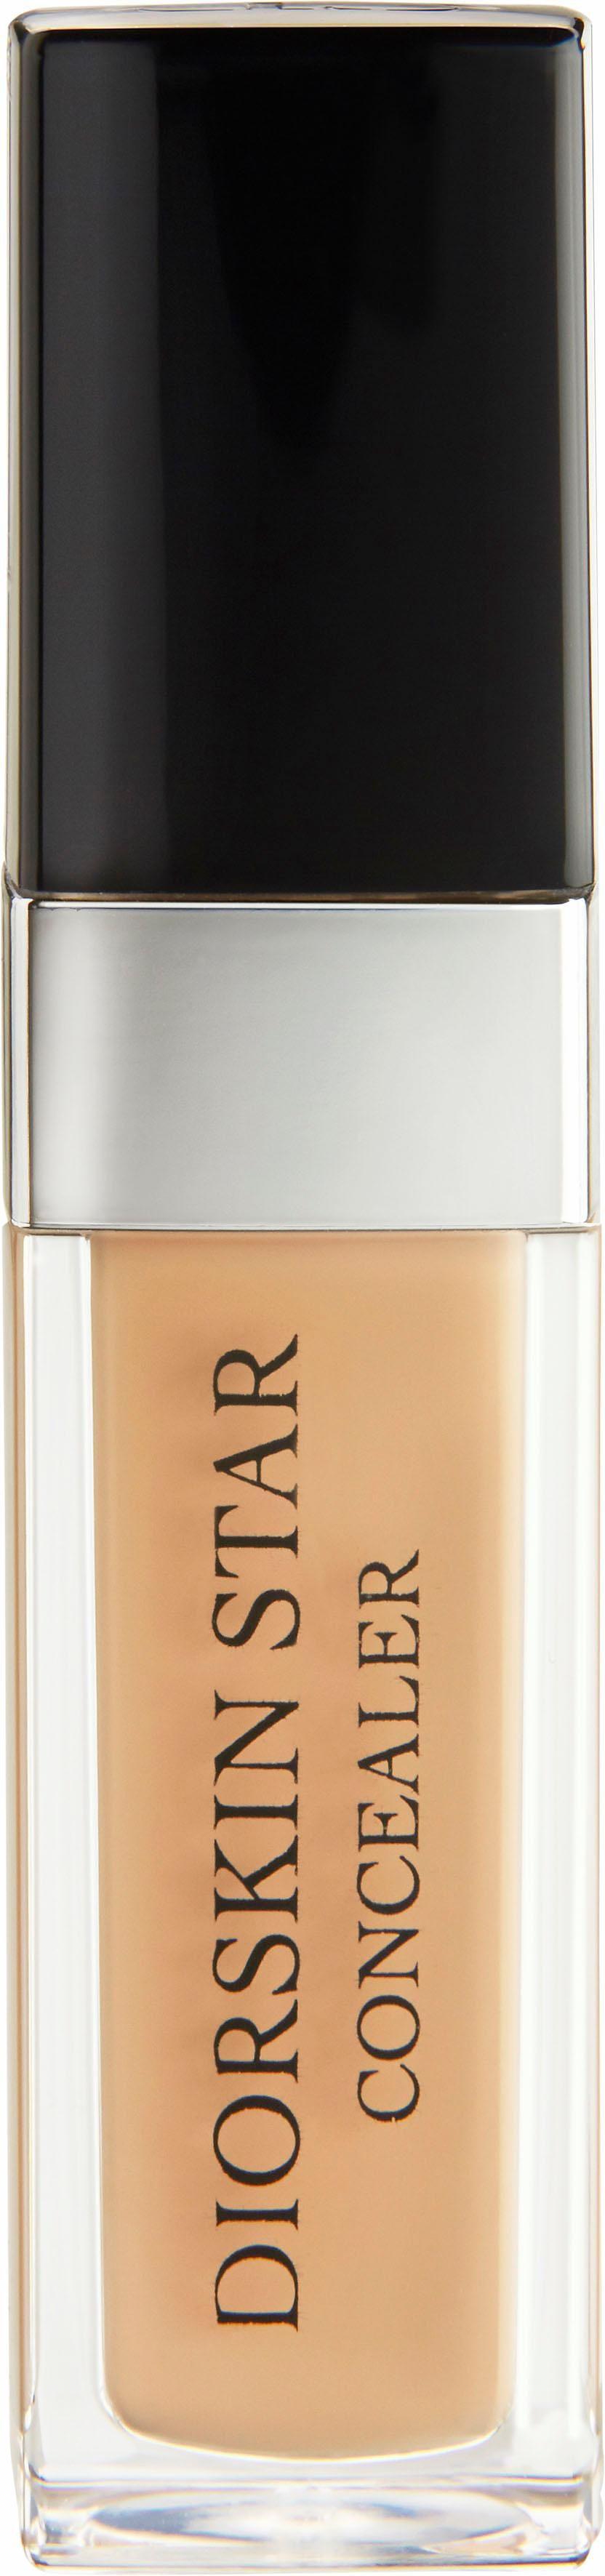 Dior, »Diorskin Star«, Concealer